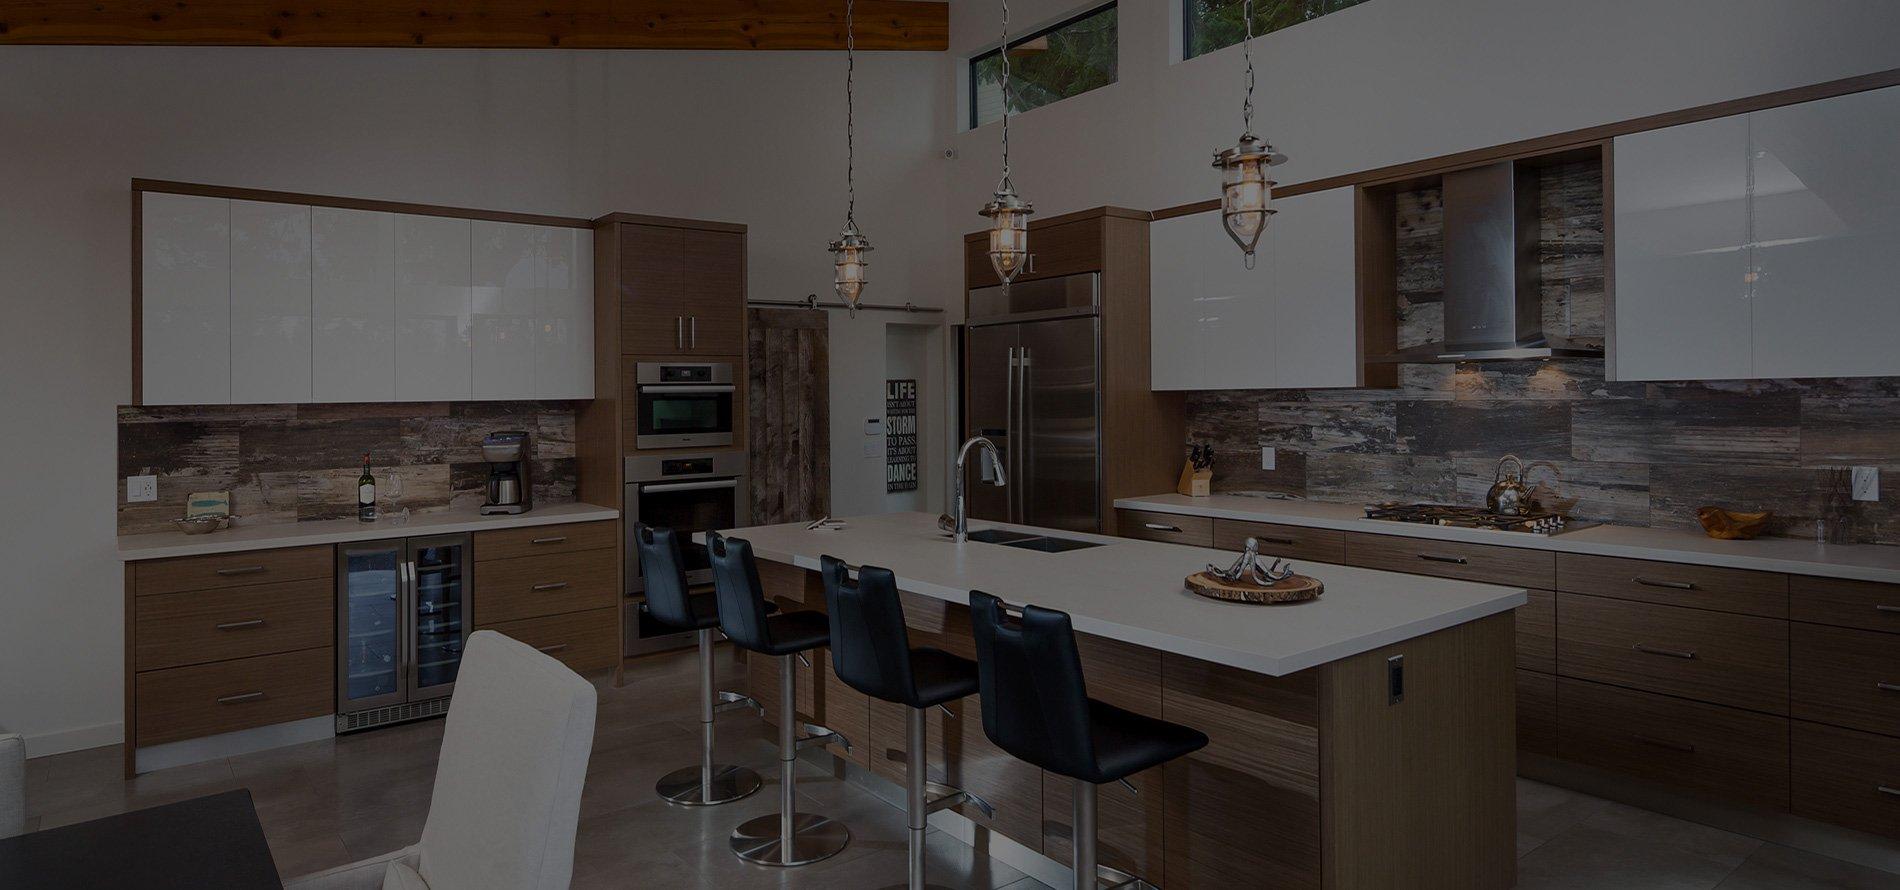 Kitchen Renovation Mapleridge Cliffhouse Hmp O